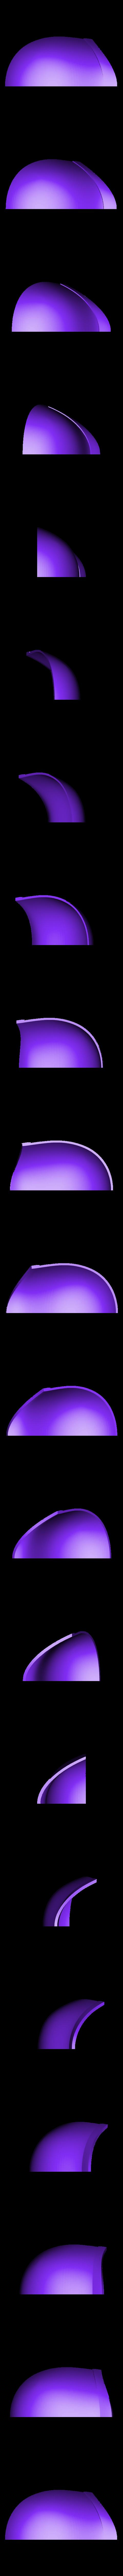 Part_15_v2_5.stl Download free STL file  Iron Musketeer's Helmet (Final Fantasy XI) • 3D printable design, VillainousPropShop